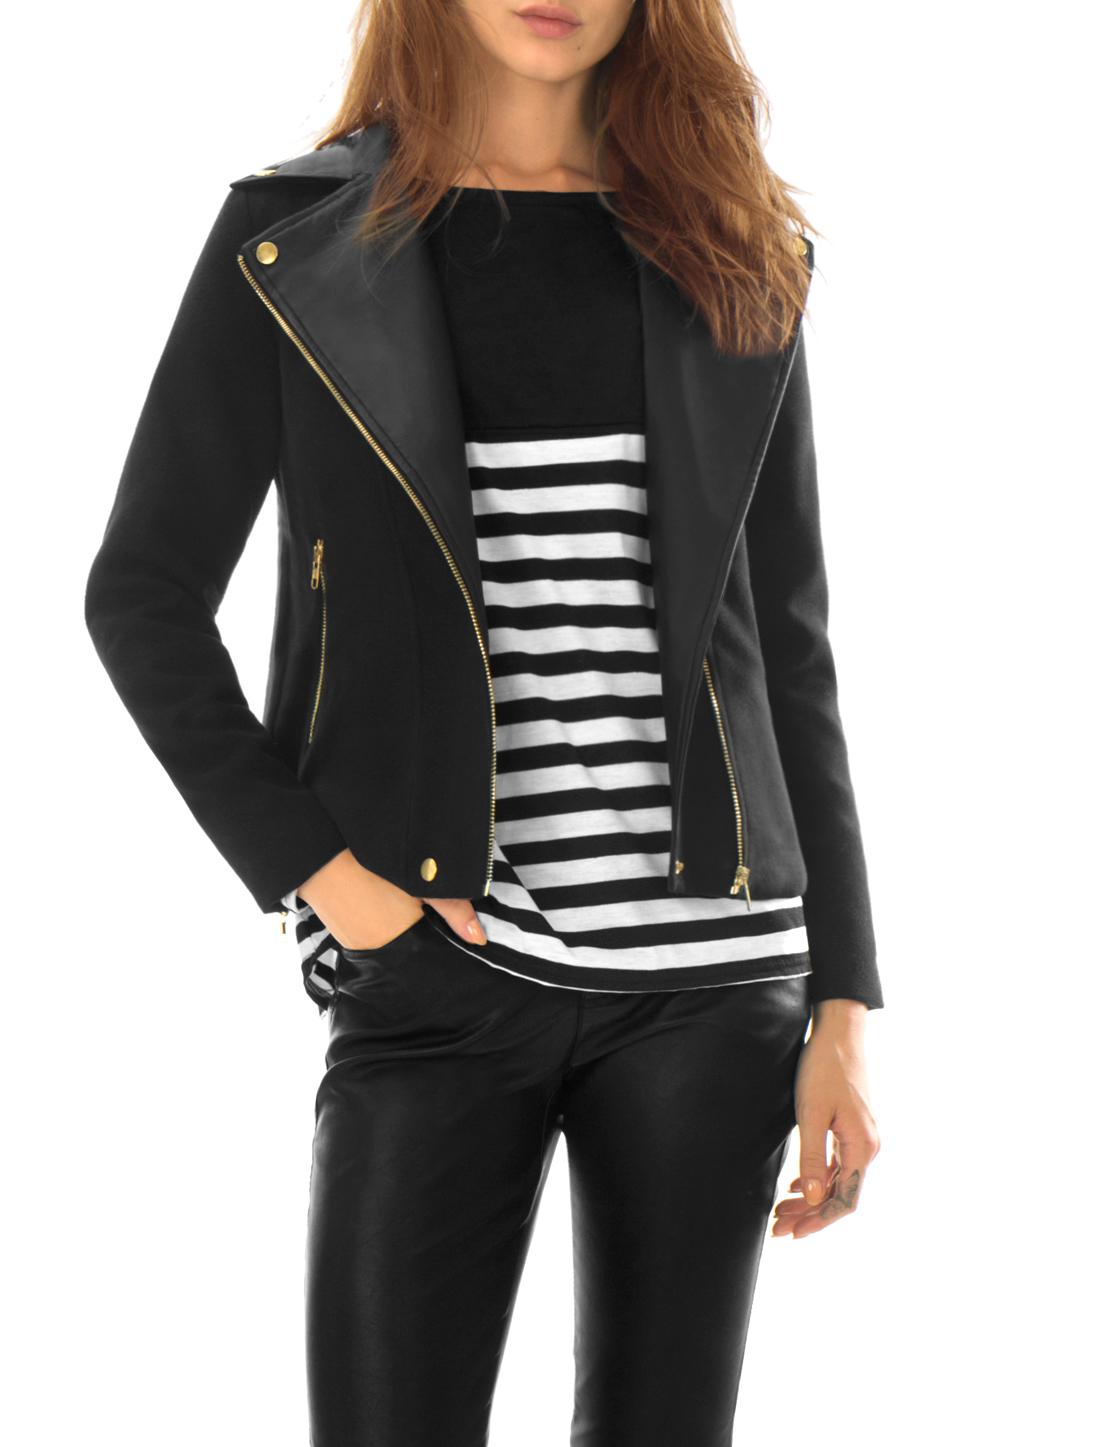 Women Asymmetrical Zipper Front PU Panel Worsted Jacket Black XL